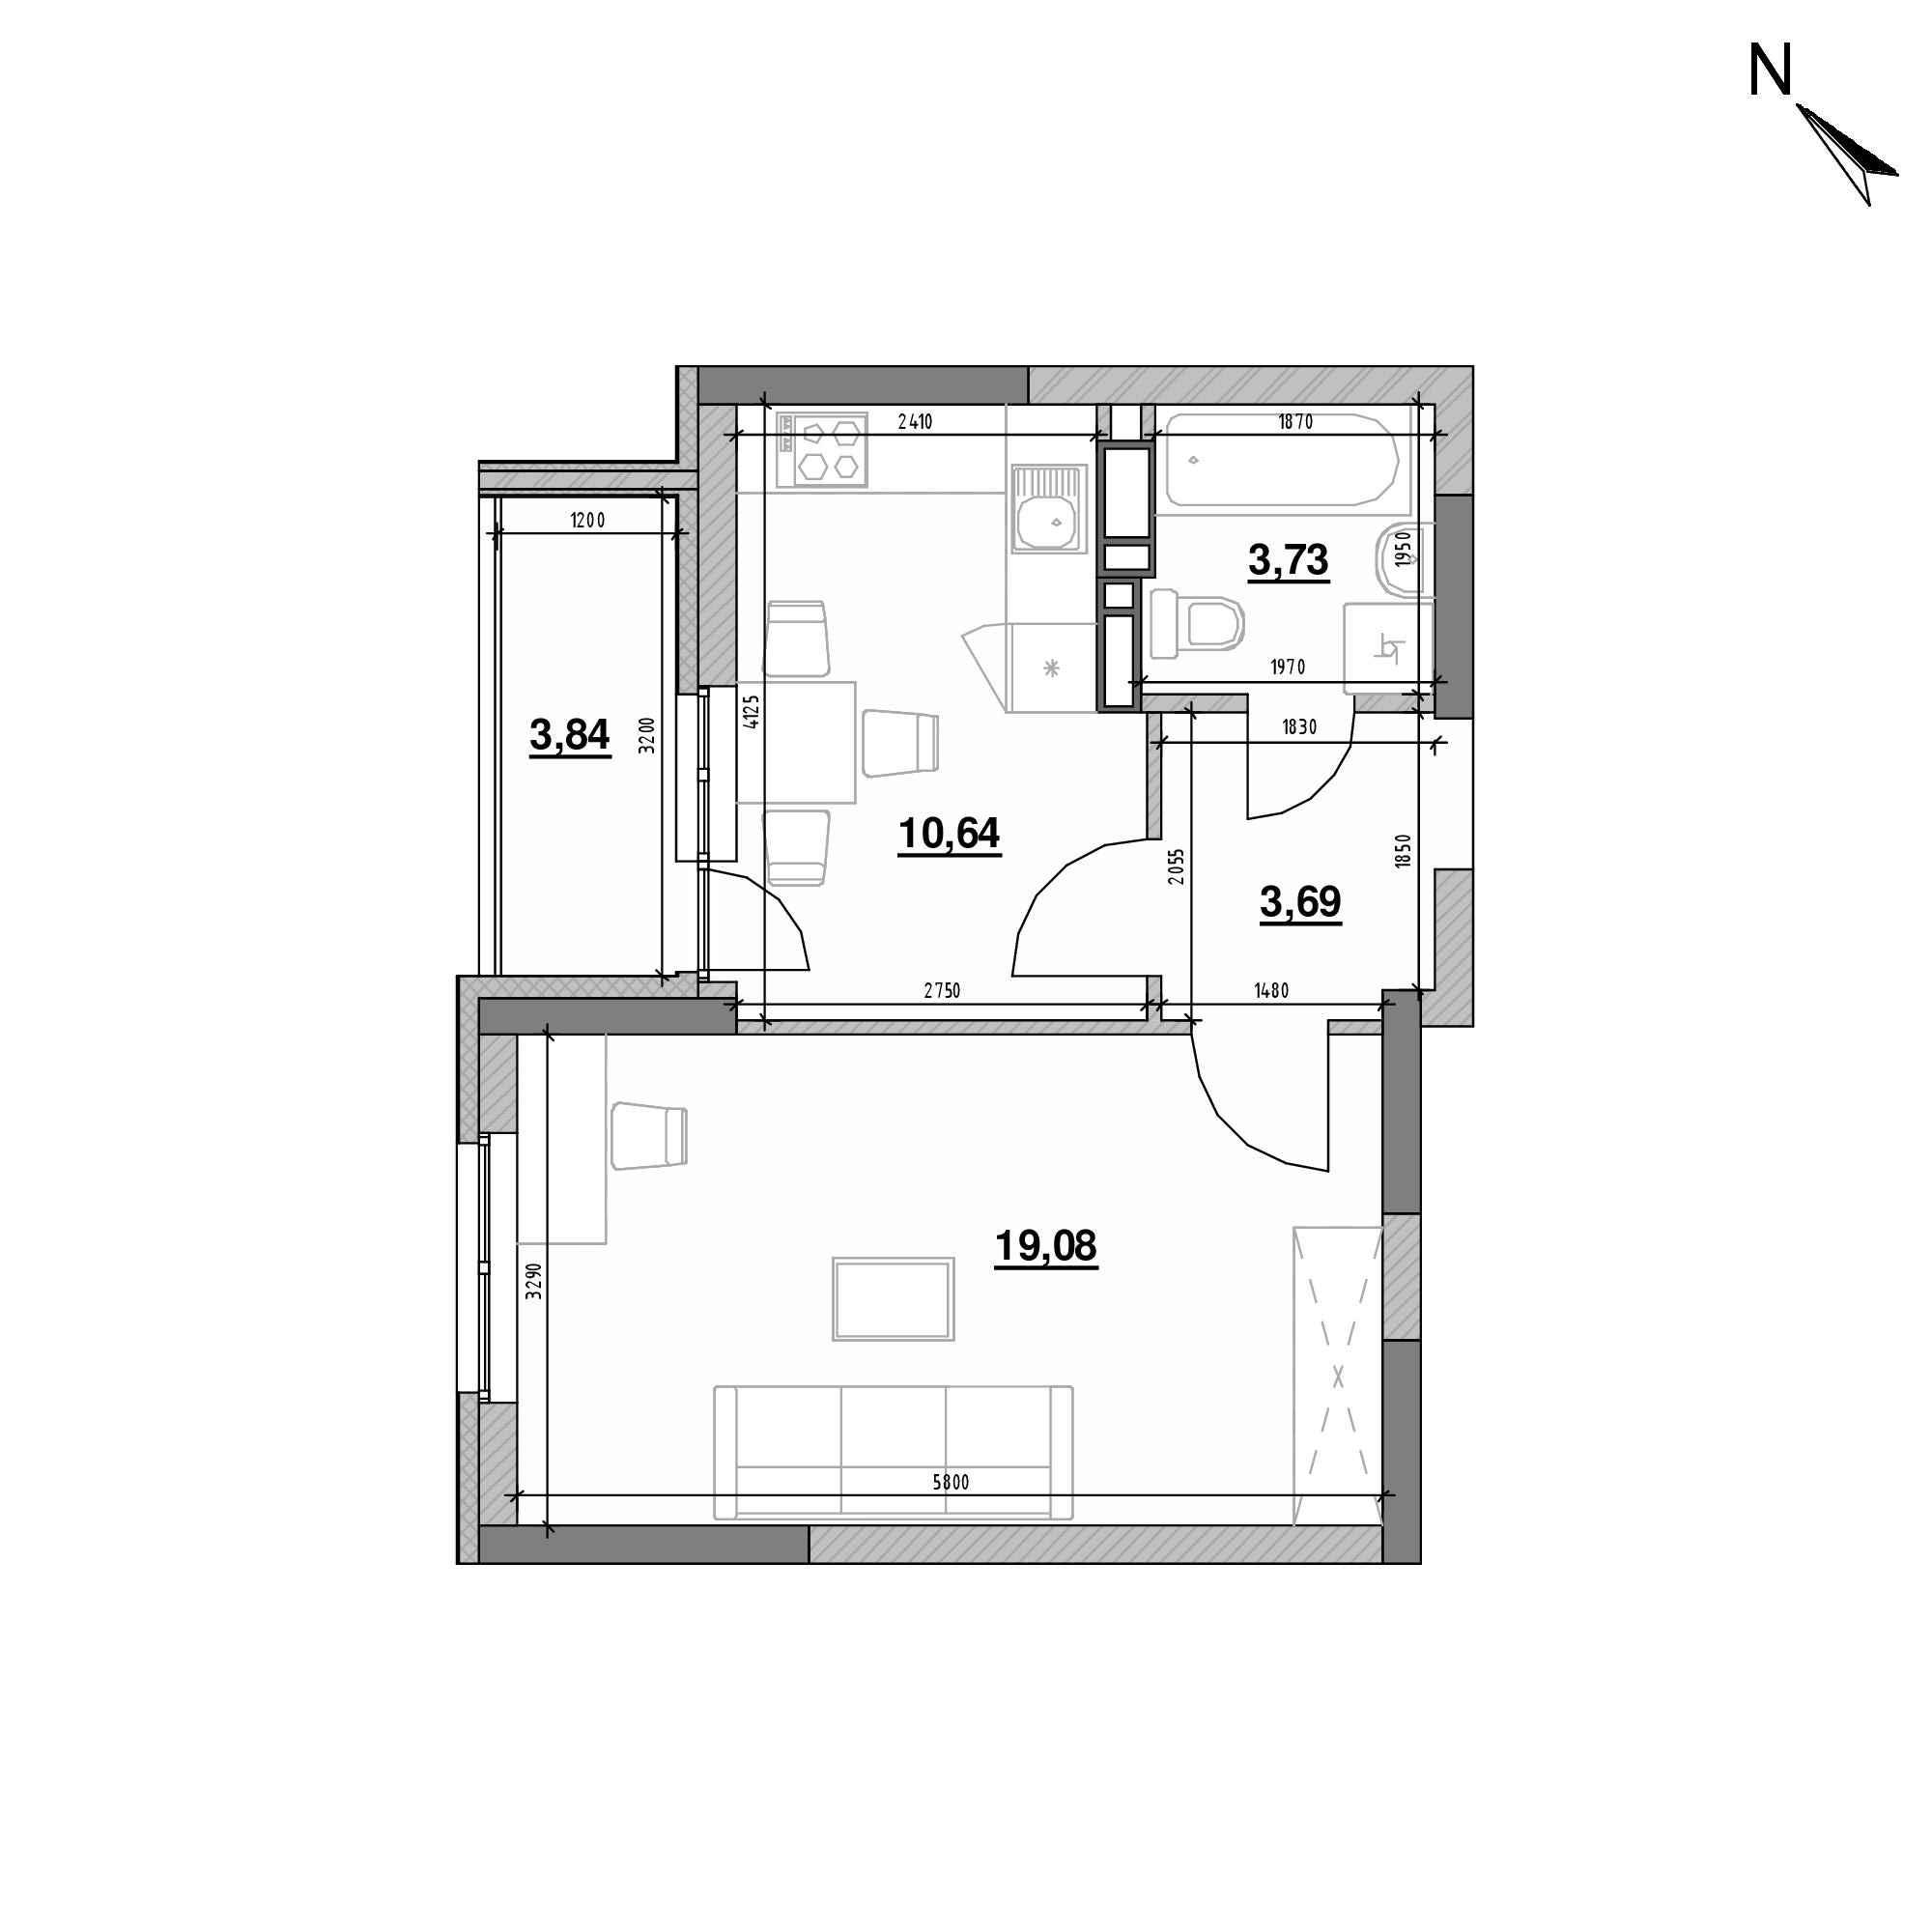 ЖК Оk'Land: планування 1-кімнатної квартири, №143, 40.98 м<sup>2</sup>